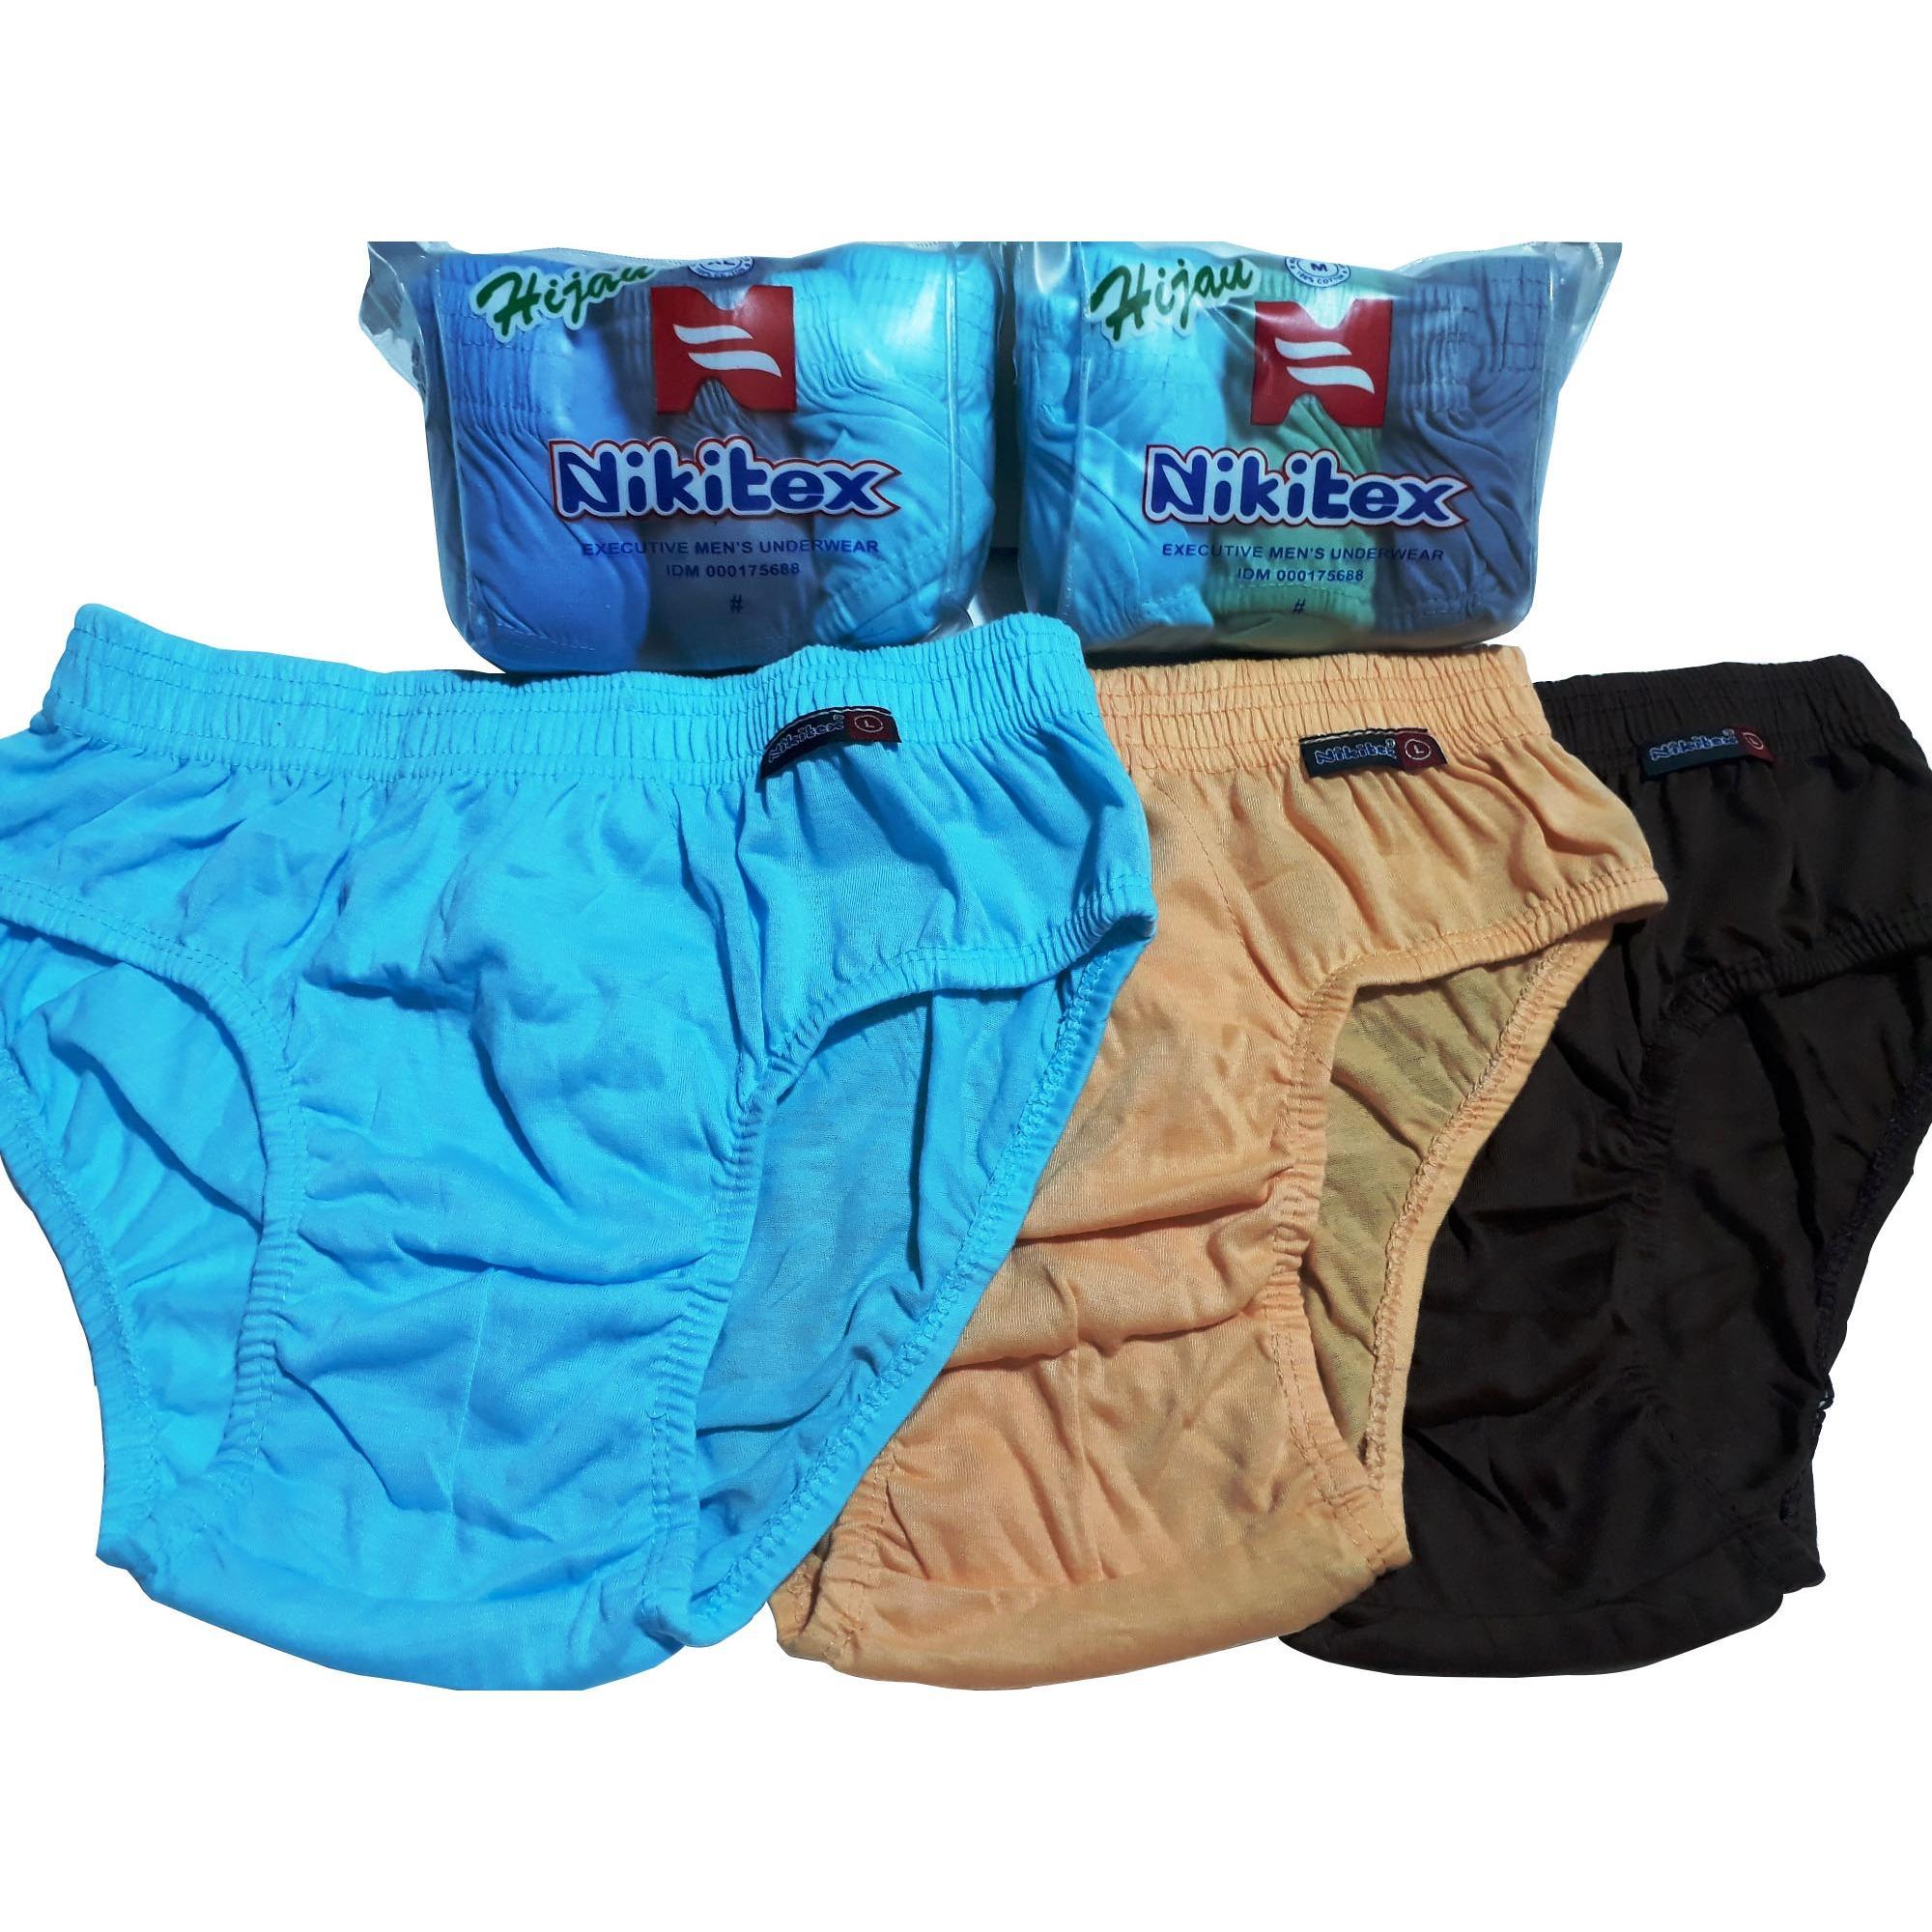 Nikitex ORI Celana Dalam Pria 3 Pcs